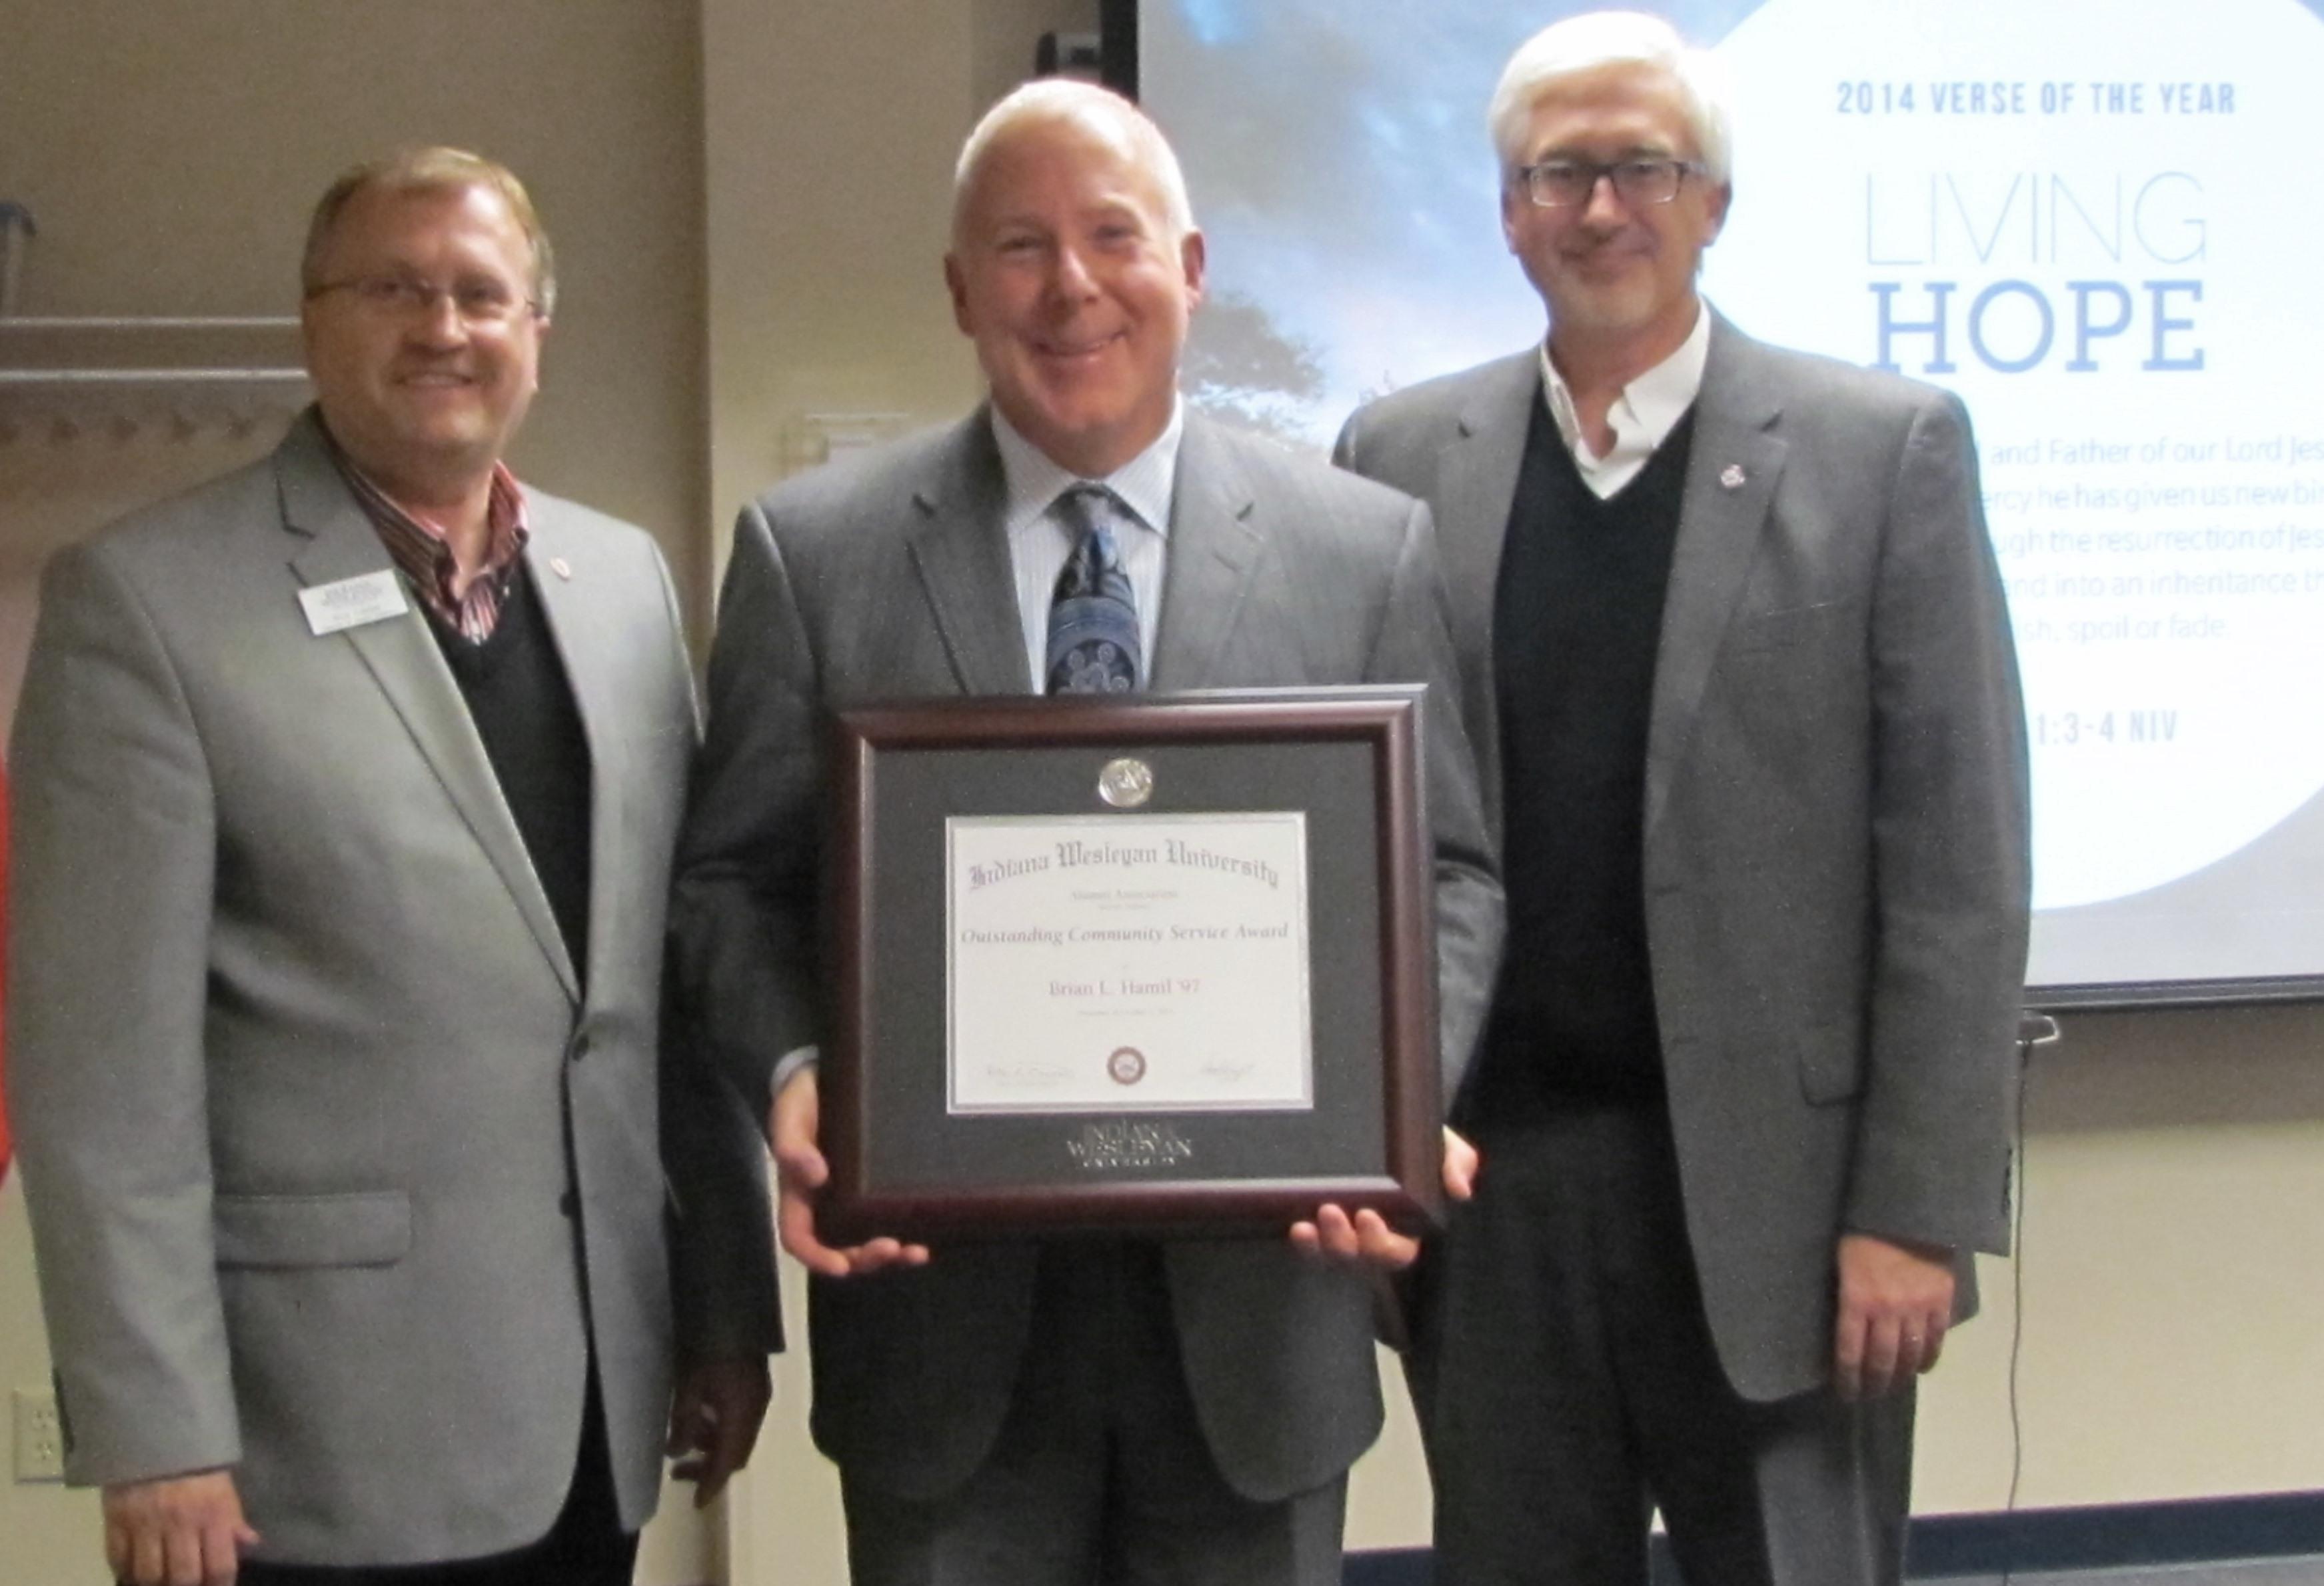 Alumni Community Service Award